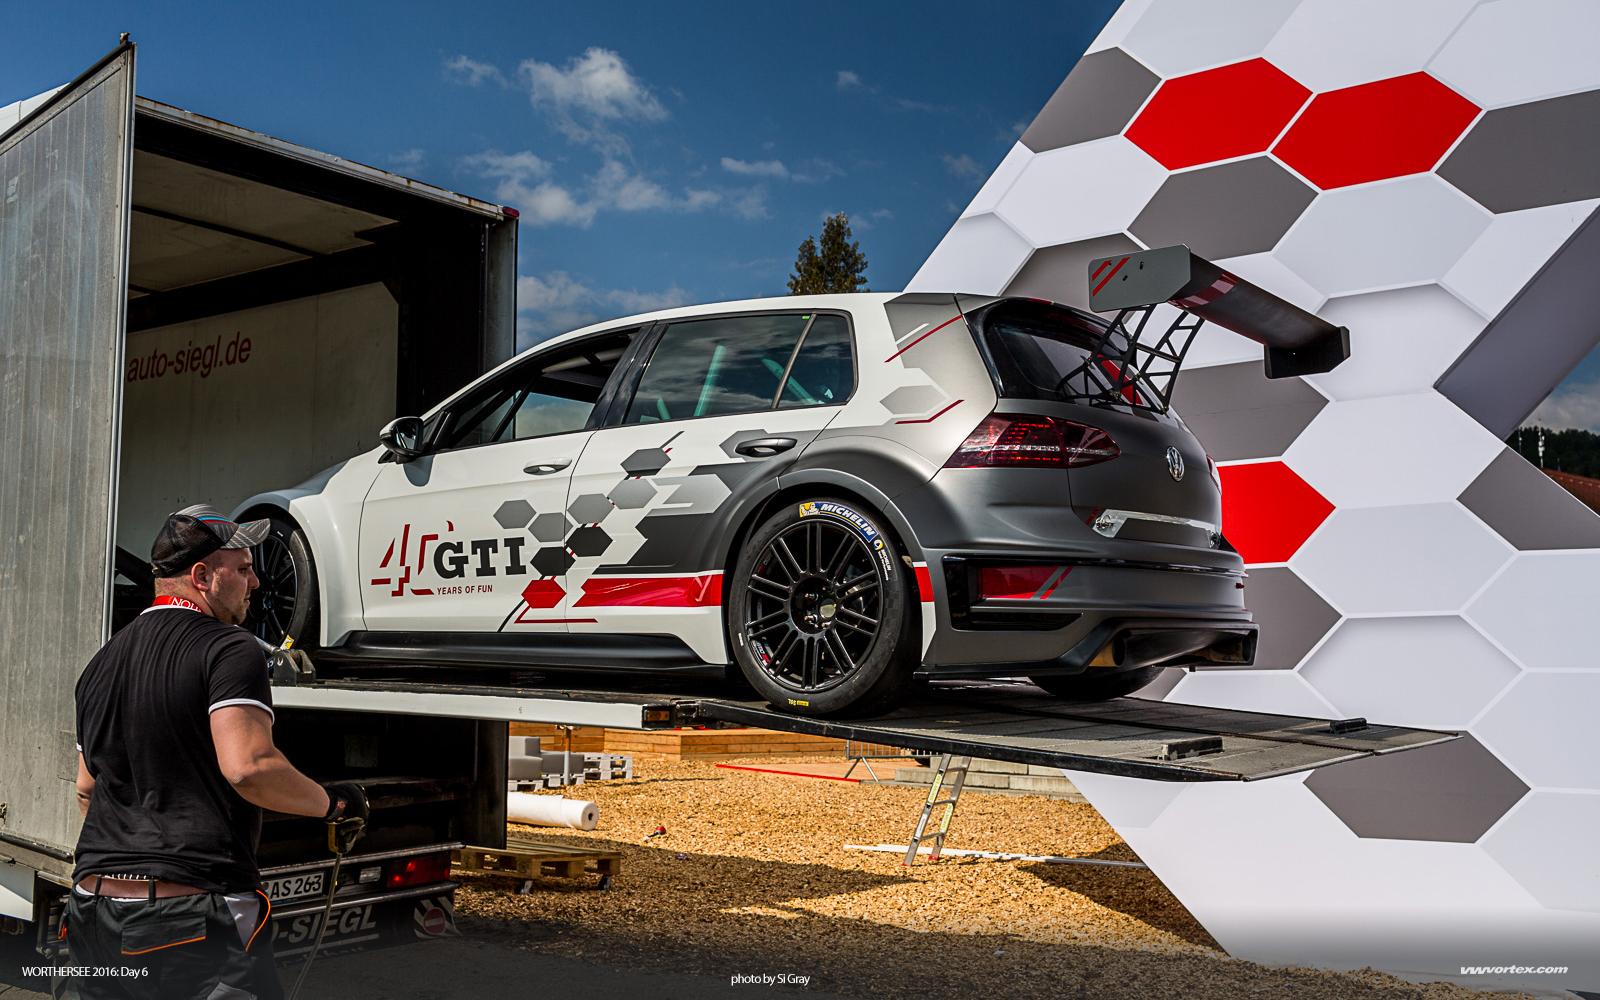 2015 Audi Sport TT Cup Norisring Doreen Seidel Playboy 281 600x300 photo